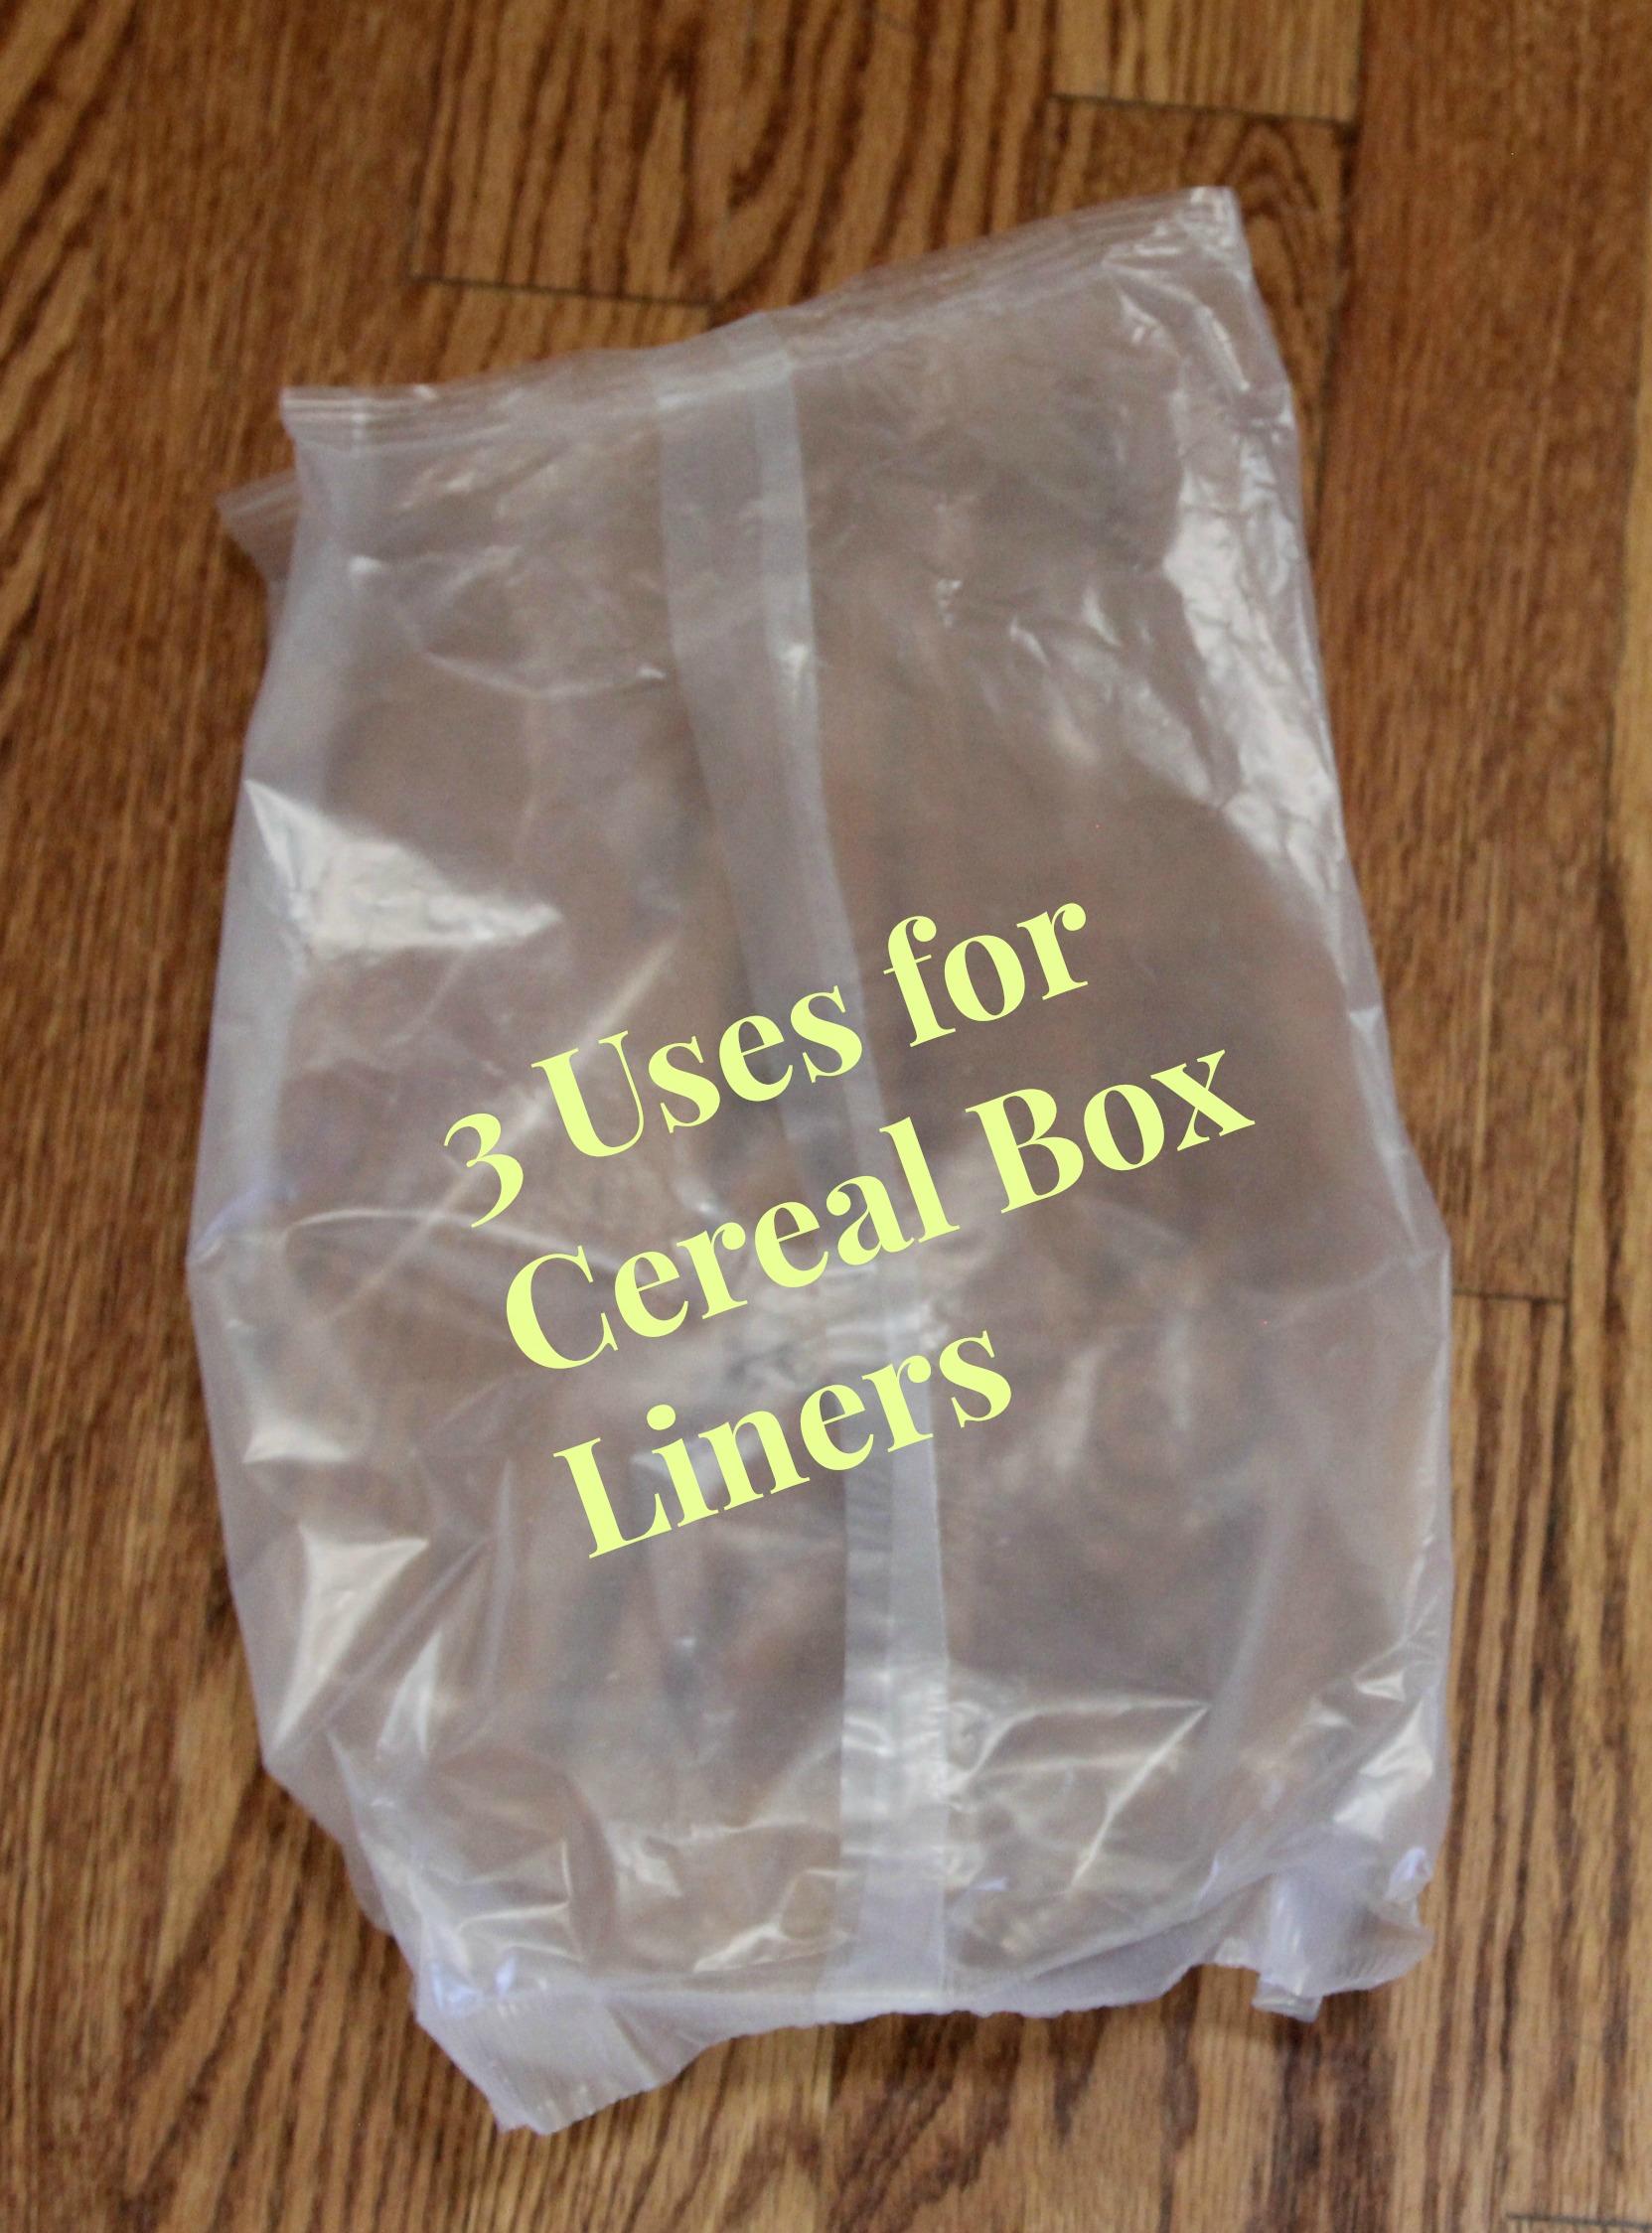 & 3 Ways to Reuse Cereal Box Liners Aboutintivar.Com